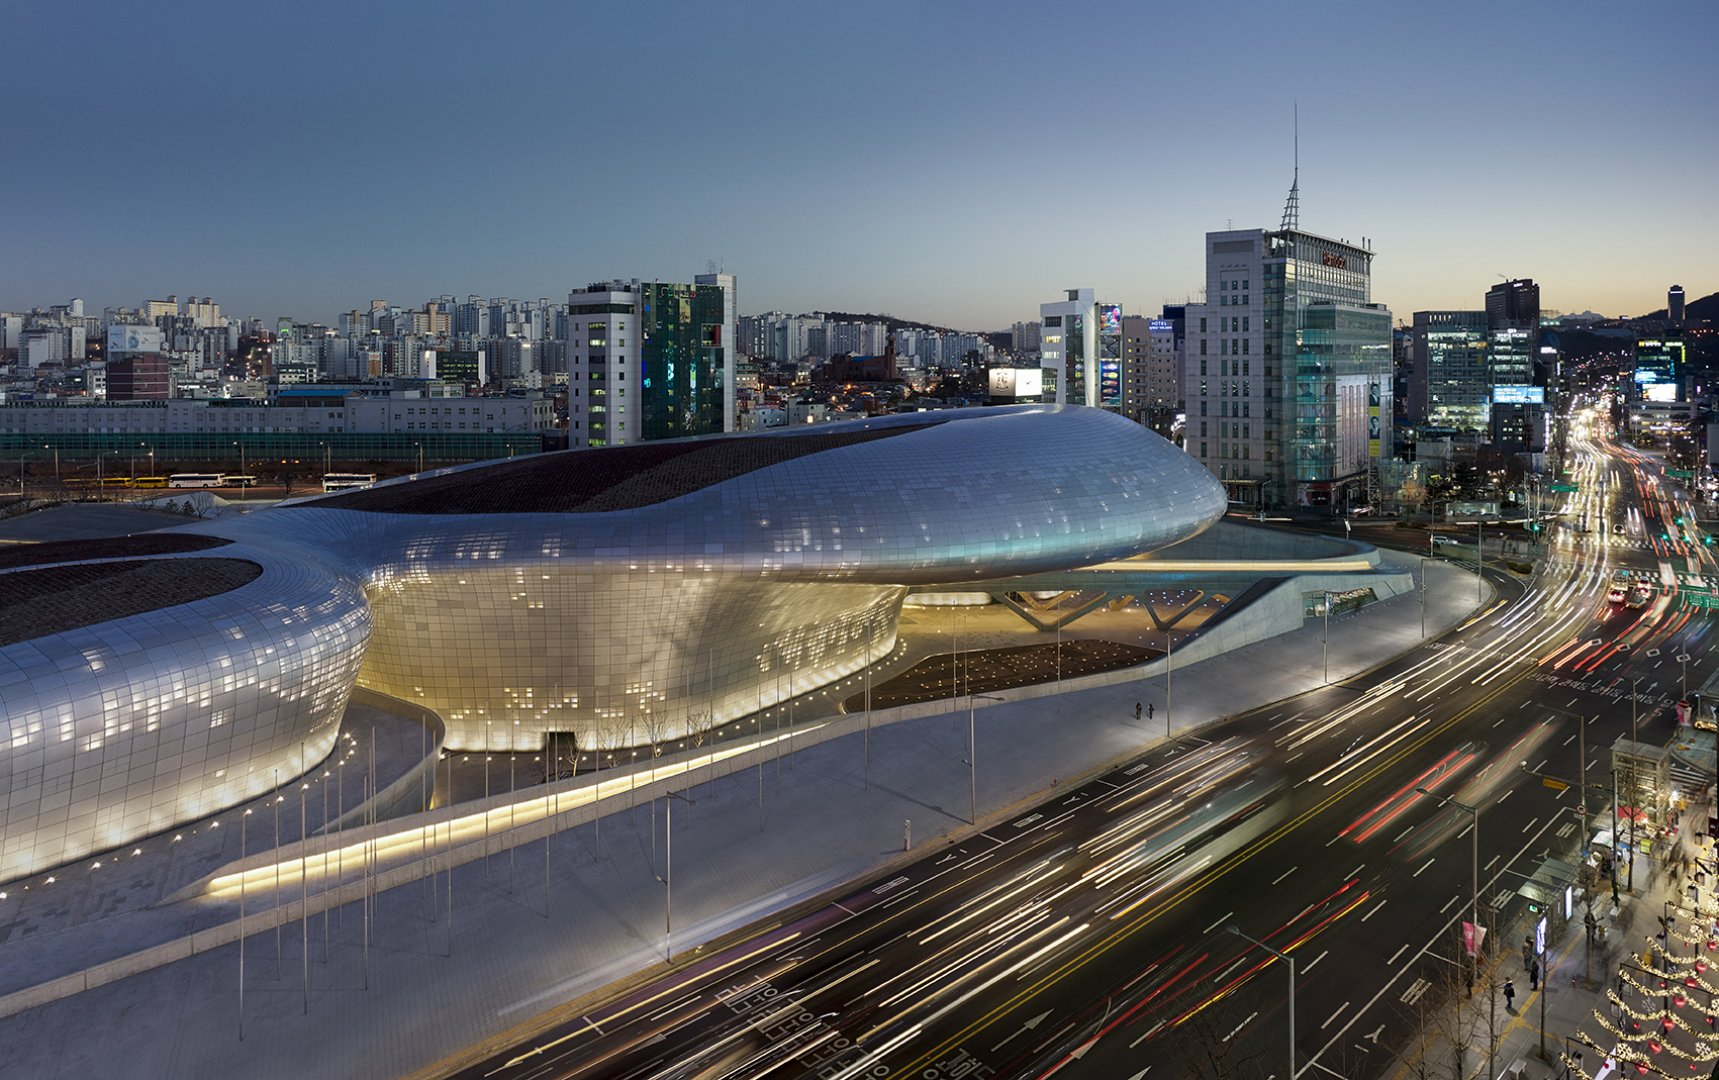 The Dongdaemun Design Plaza designed by Zaha Hadid is becoming the hub of art and fashion in South Korea. Photo Courtesy Zaha Hadid Architecture.